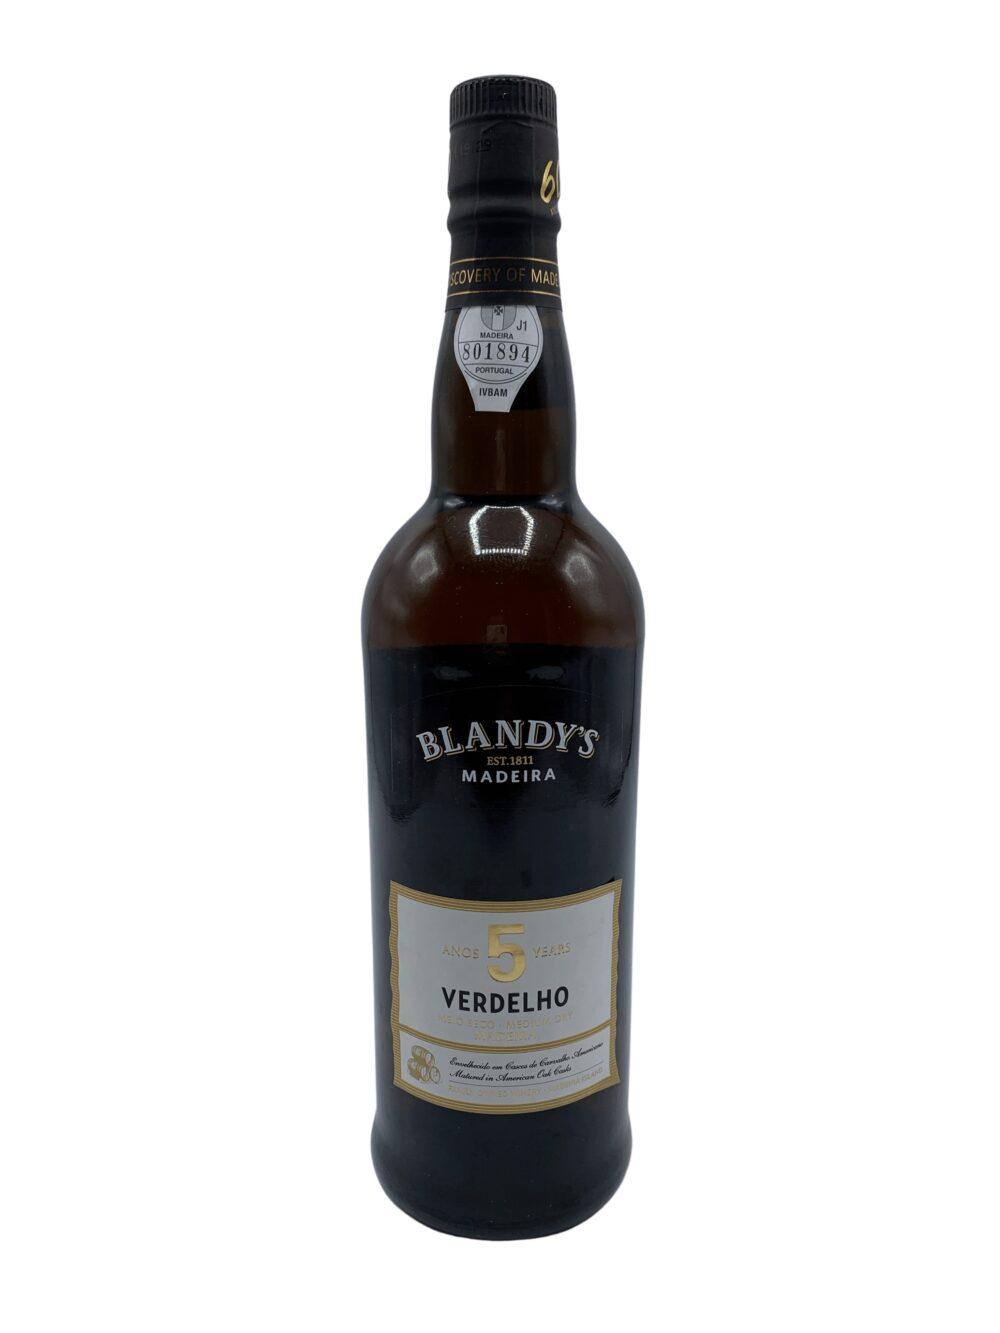 Madeira Blandy's Verdelho 5Y